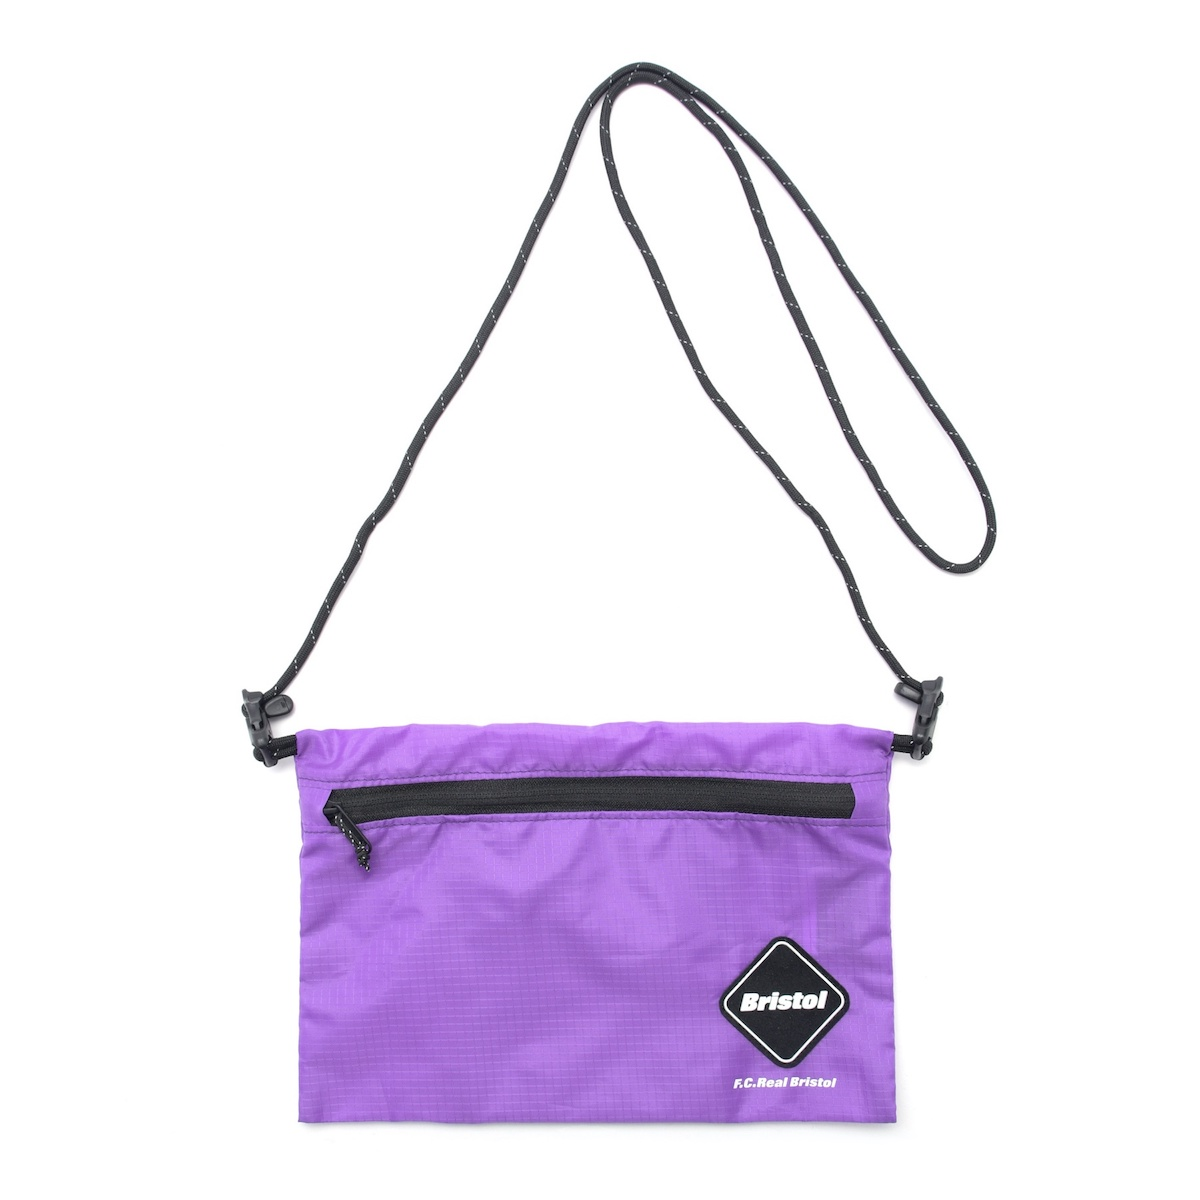 F.C.Real Bristol / EMBLEM SACOCHE (Purple)